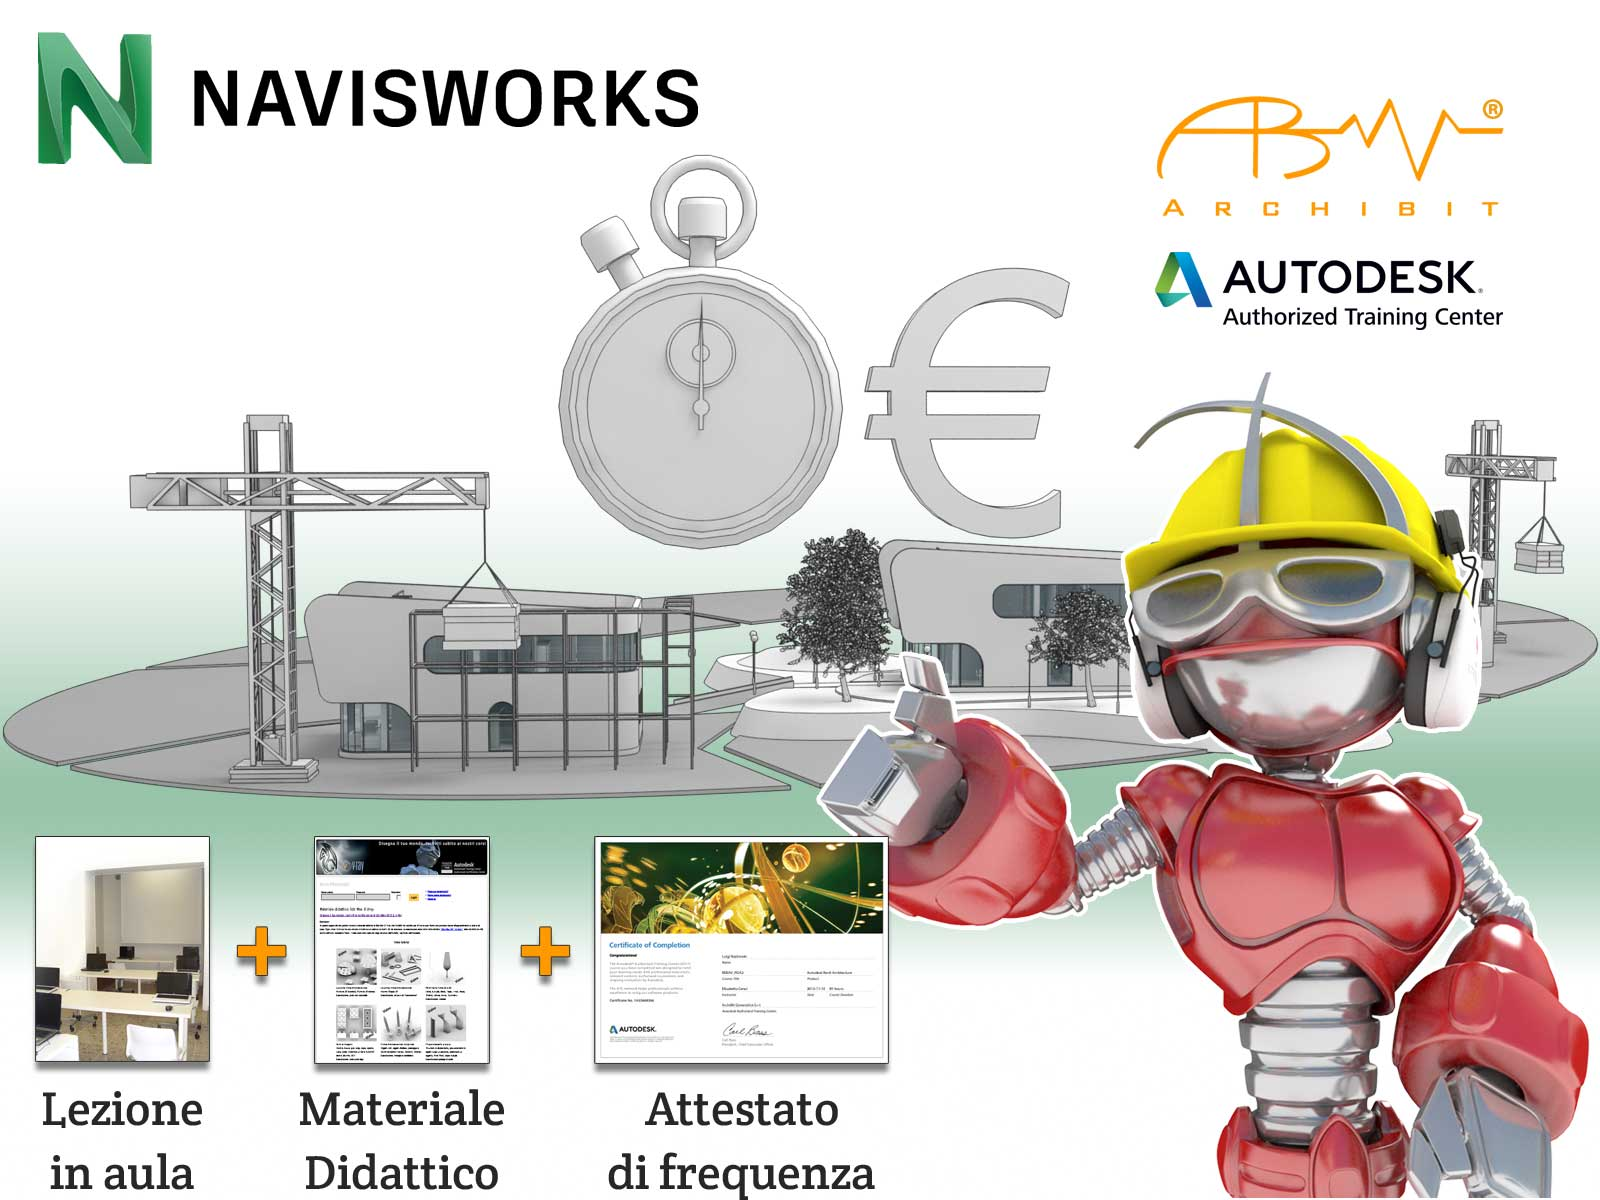 Corso Navisworks - Archibit Generation centro corsi BIM Autodesk Roma